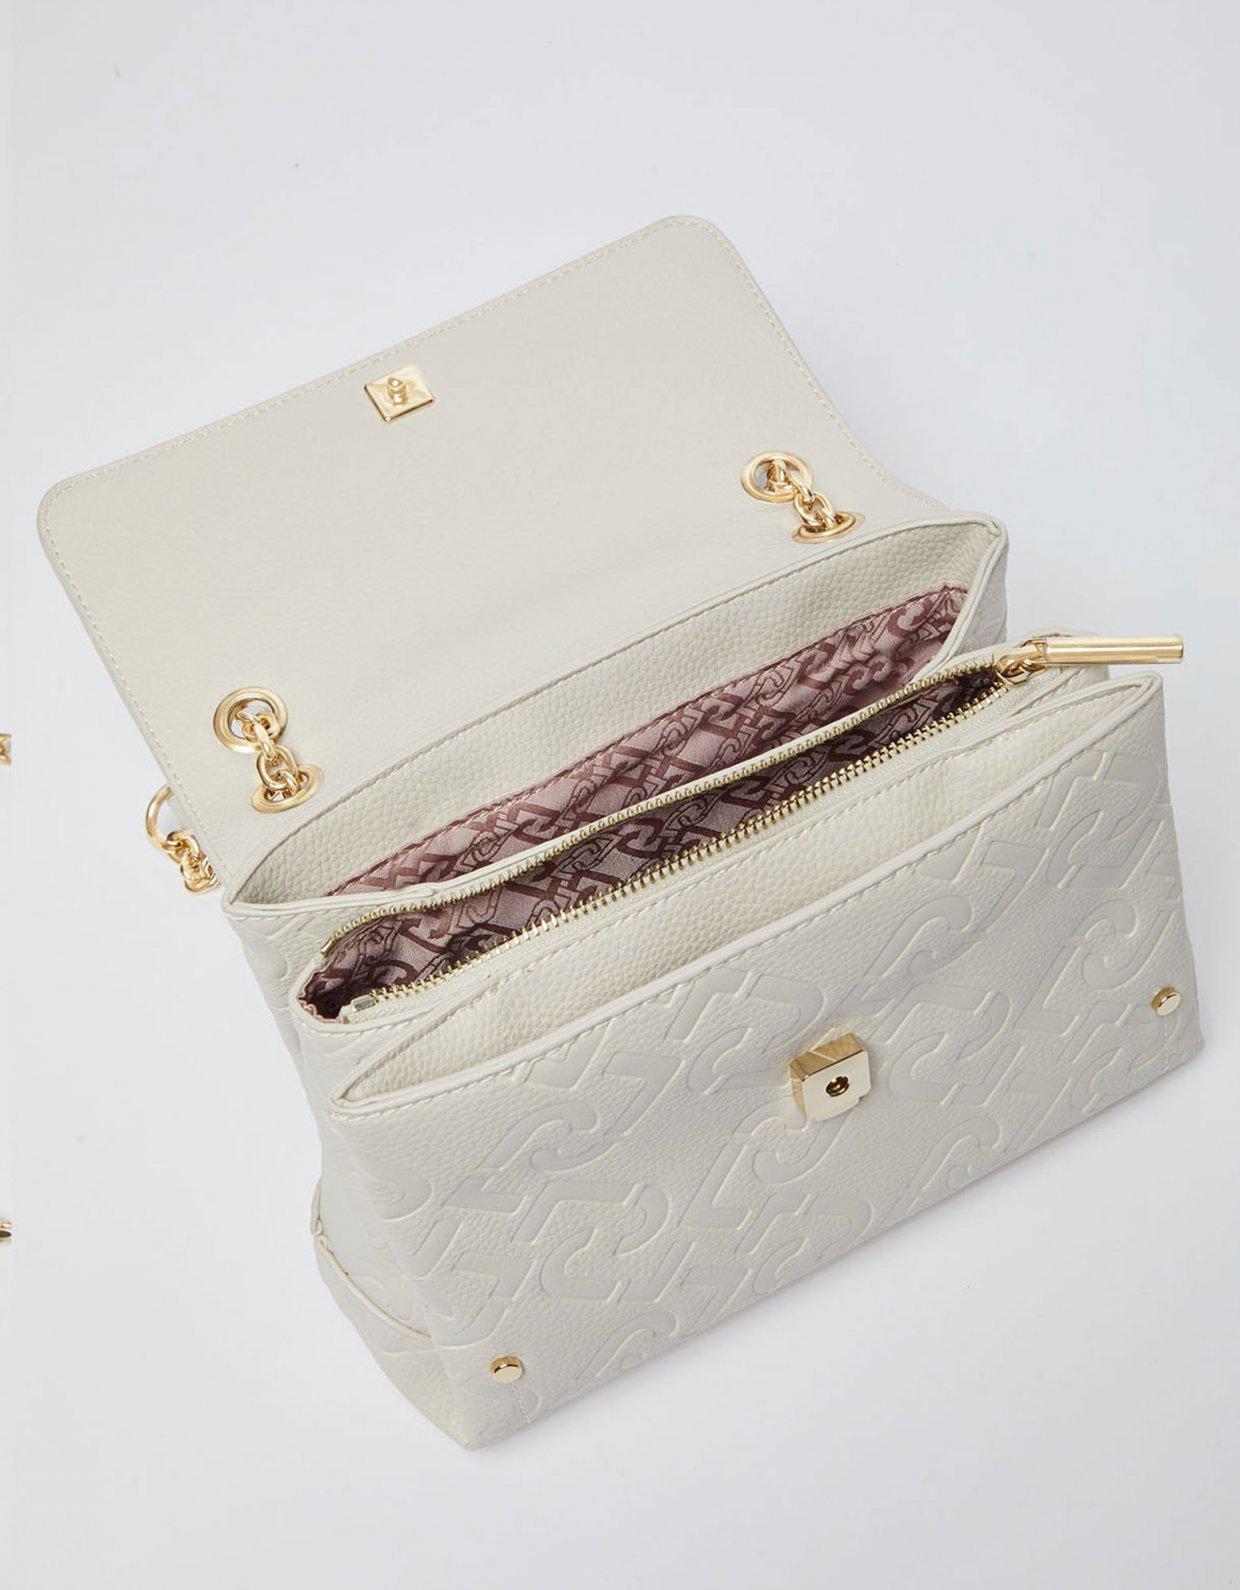 Liu Jo Eco-friendly cross body bag bone